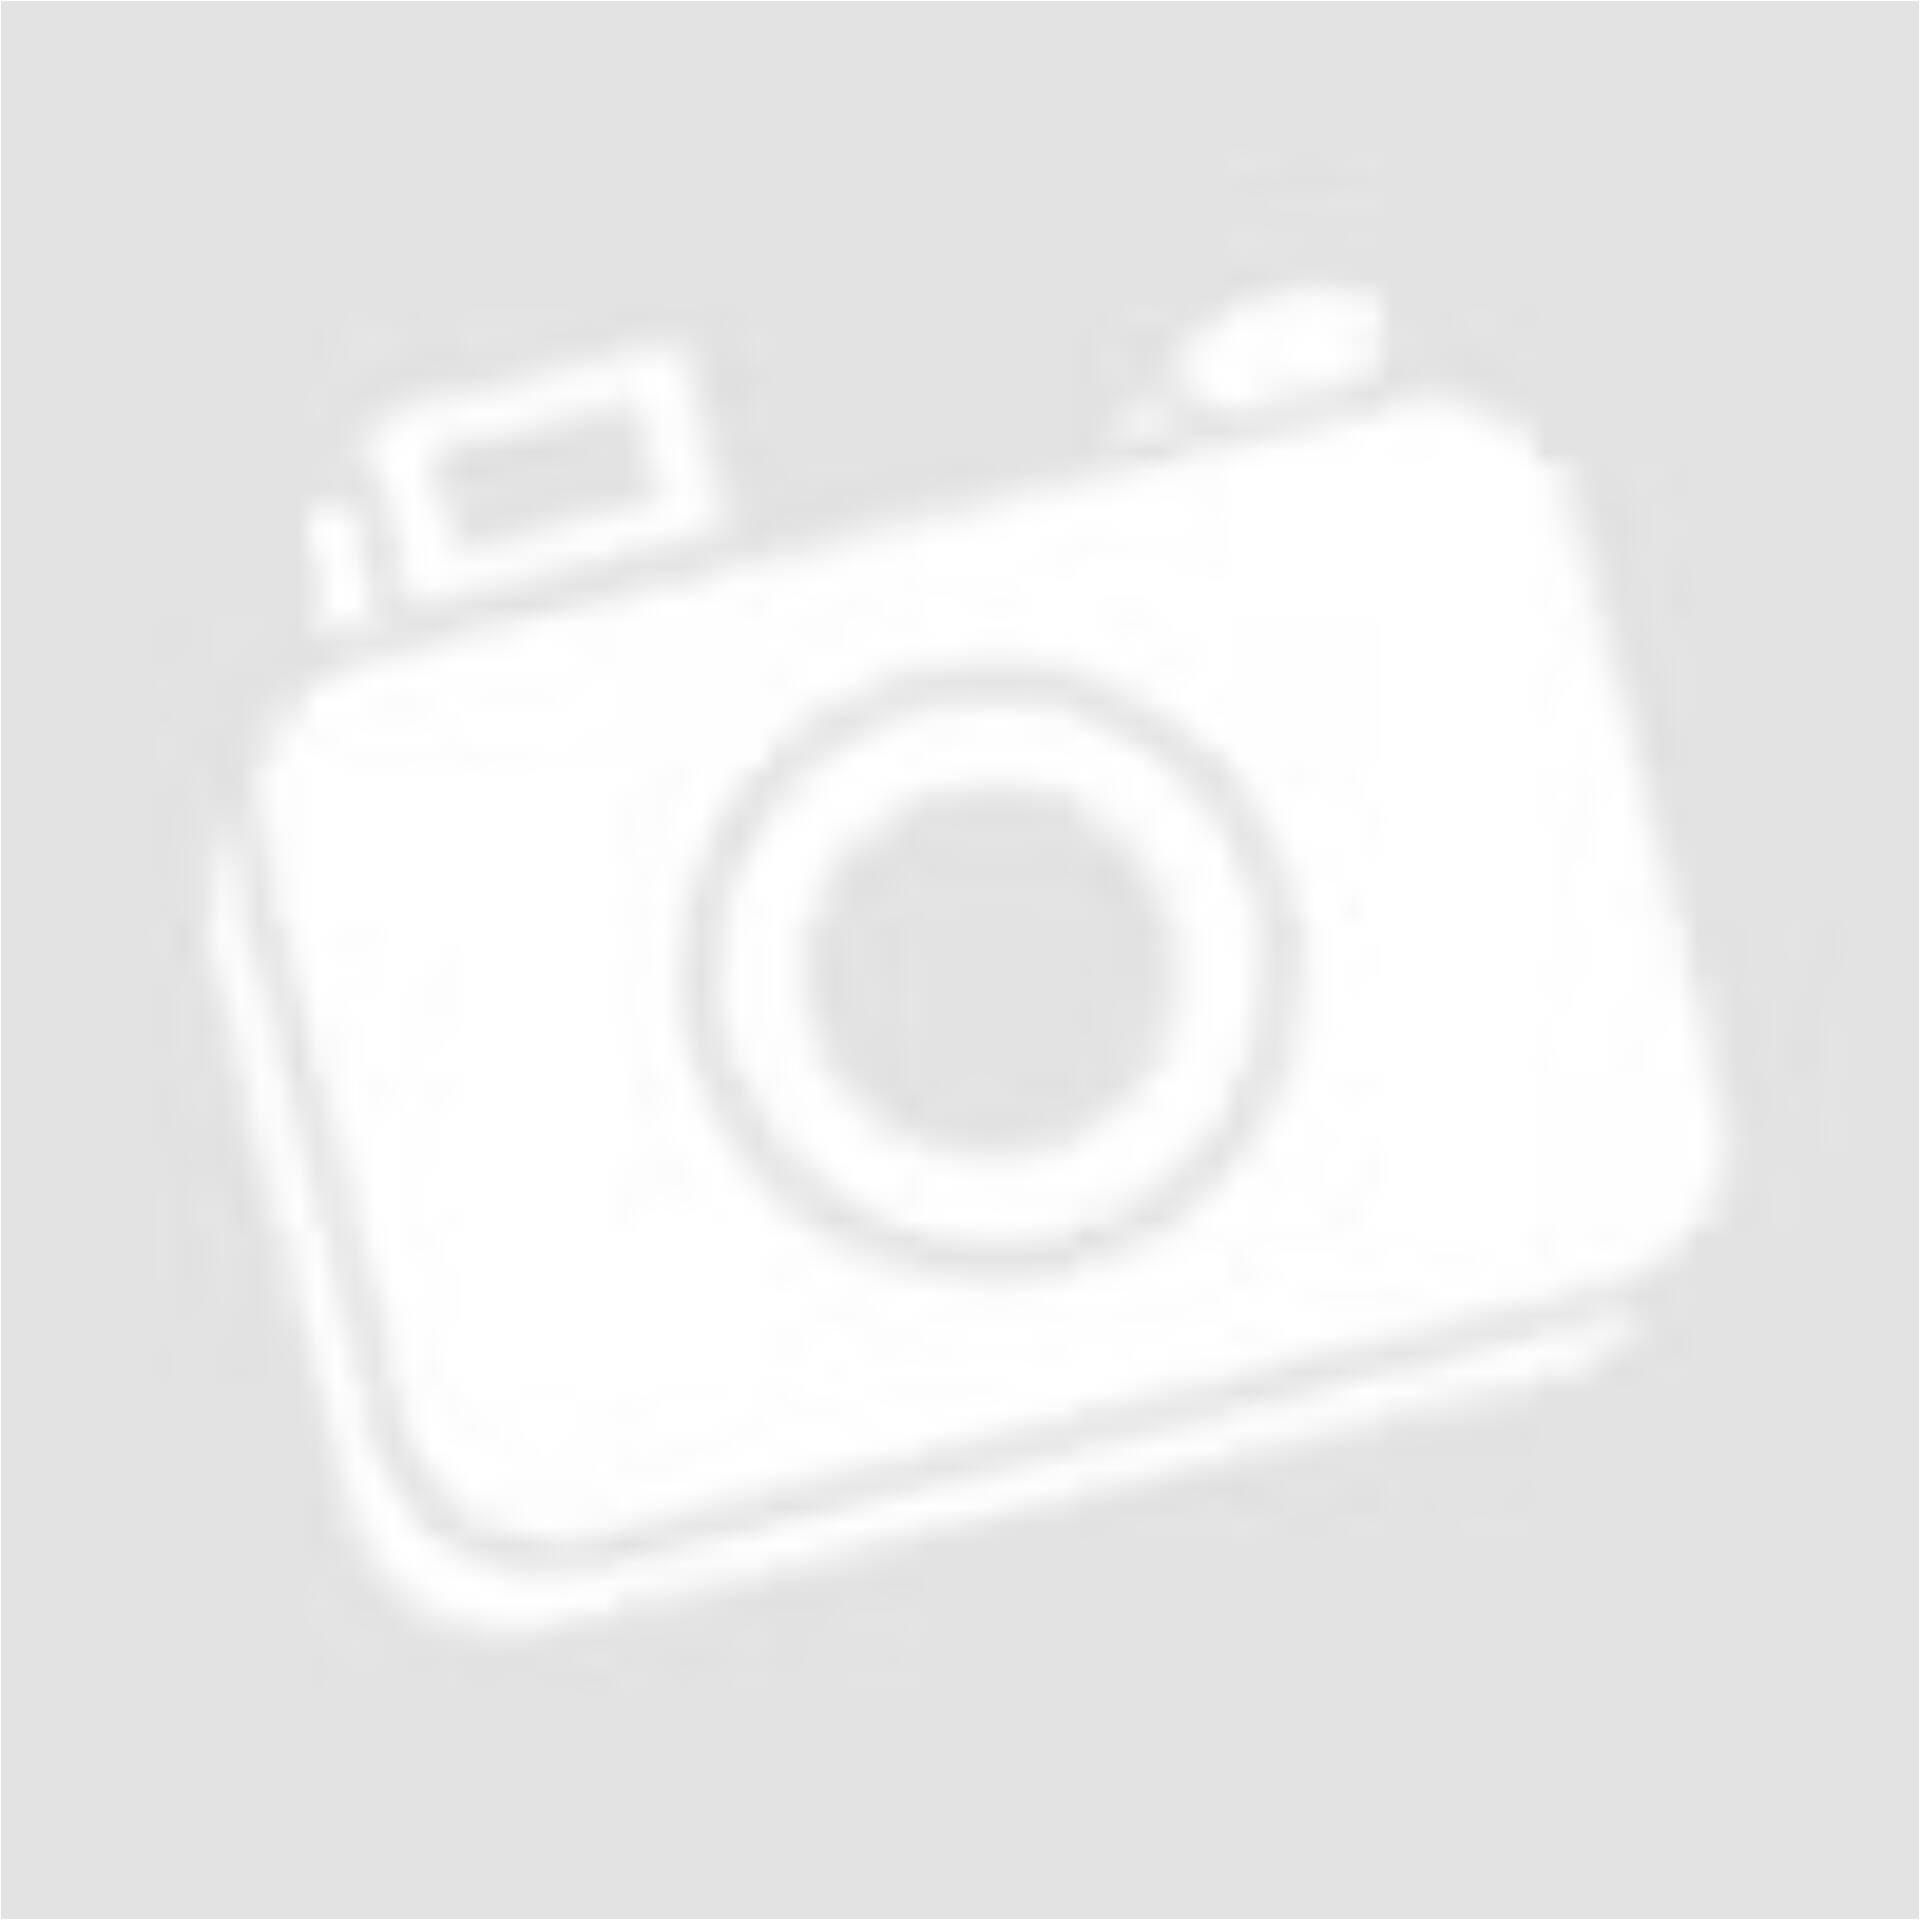 H M barna színű elegáns női blézer (Méret  S) - Női dzseki 923fdbe640